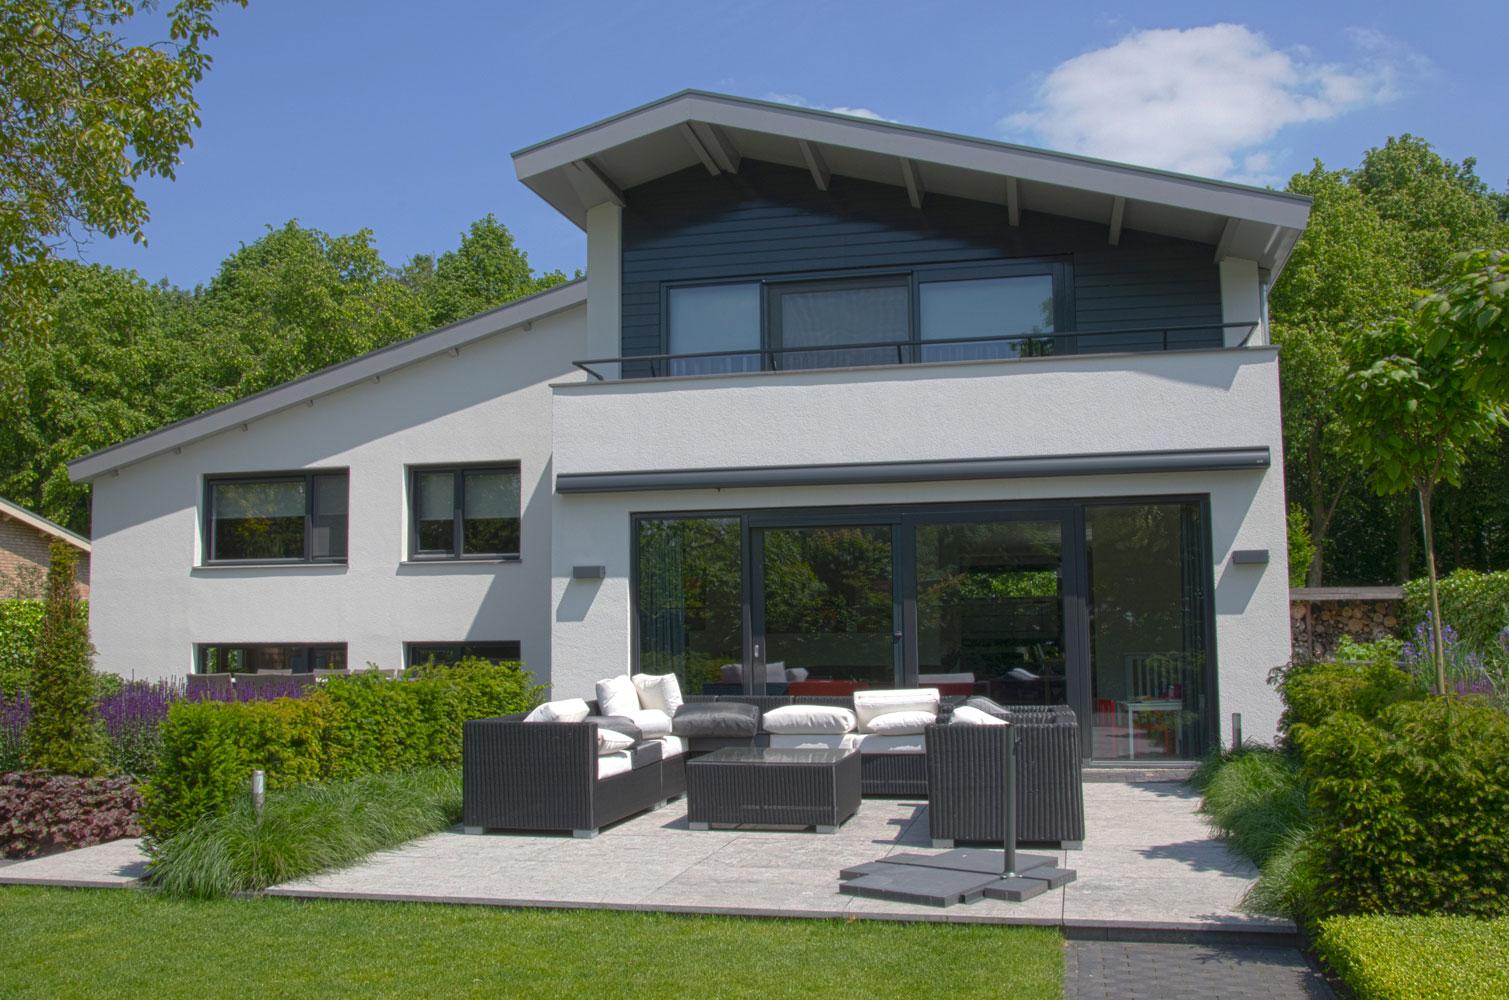 00111ext4 Verbouwing woning Etten-Leur